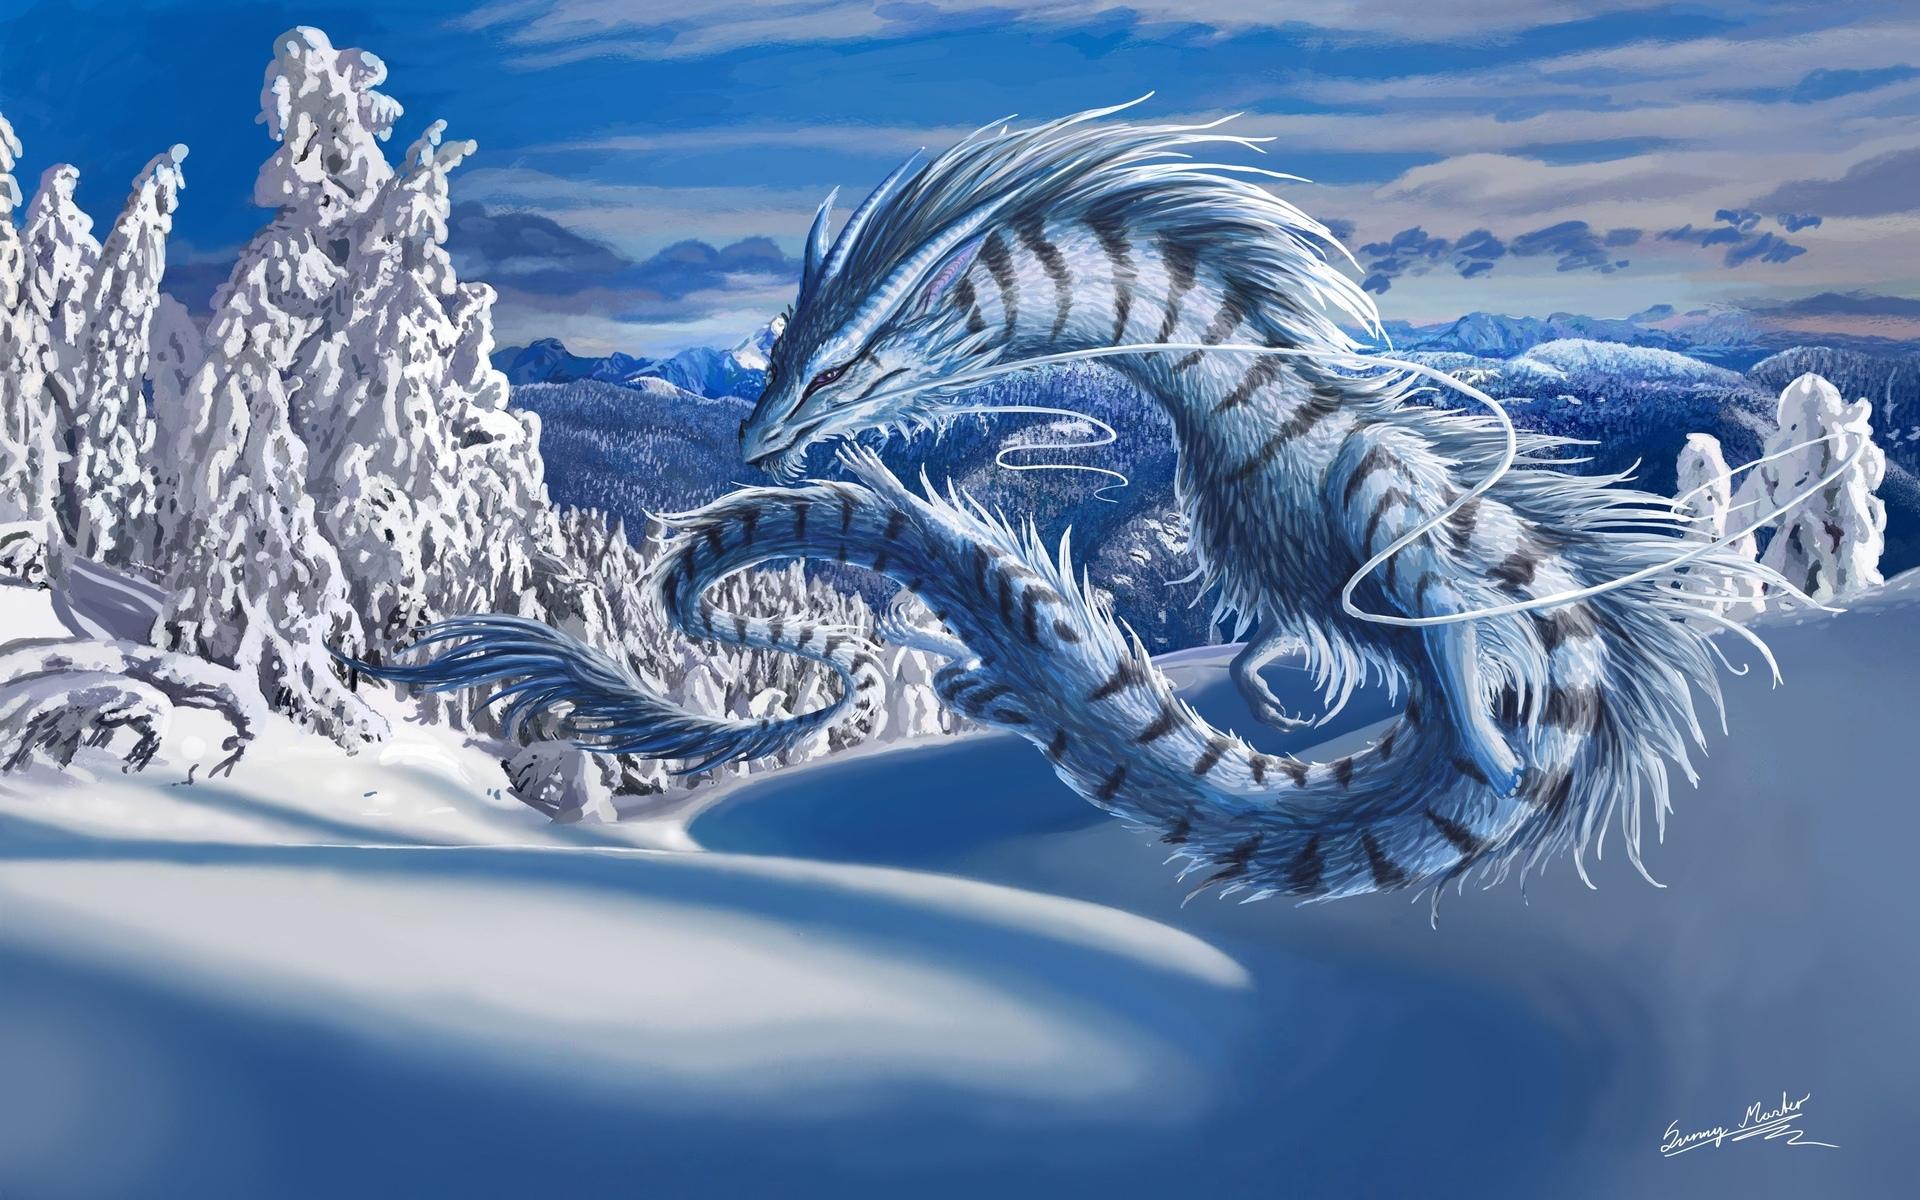 Dragonporn paradise sexy pic